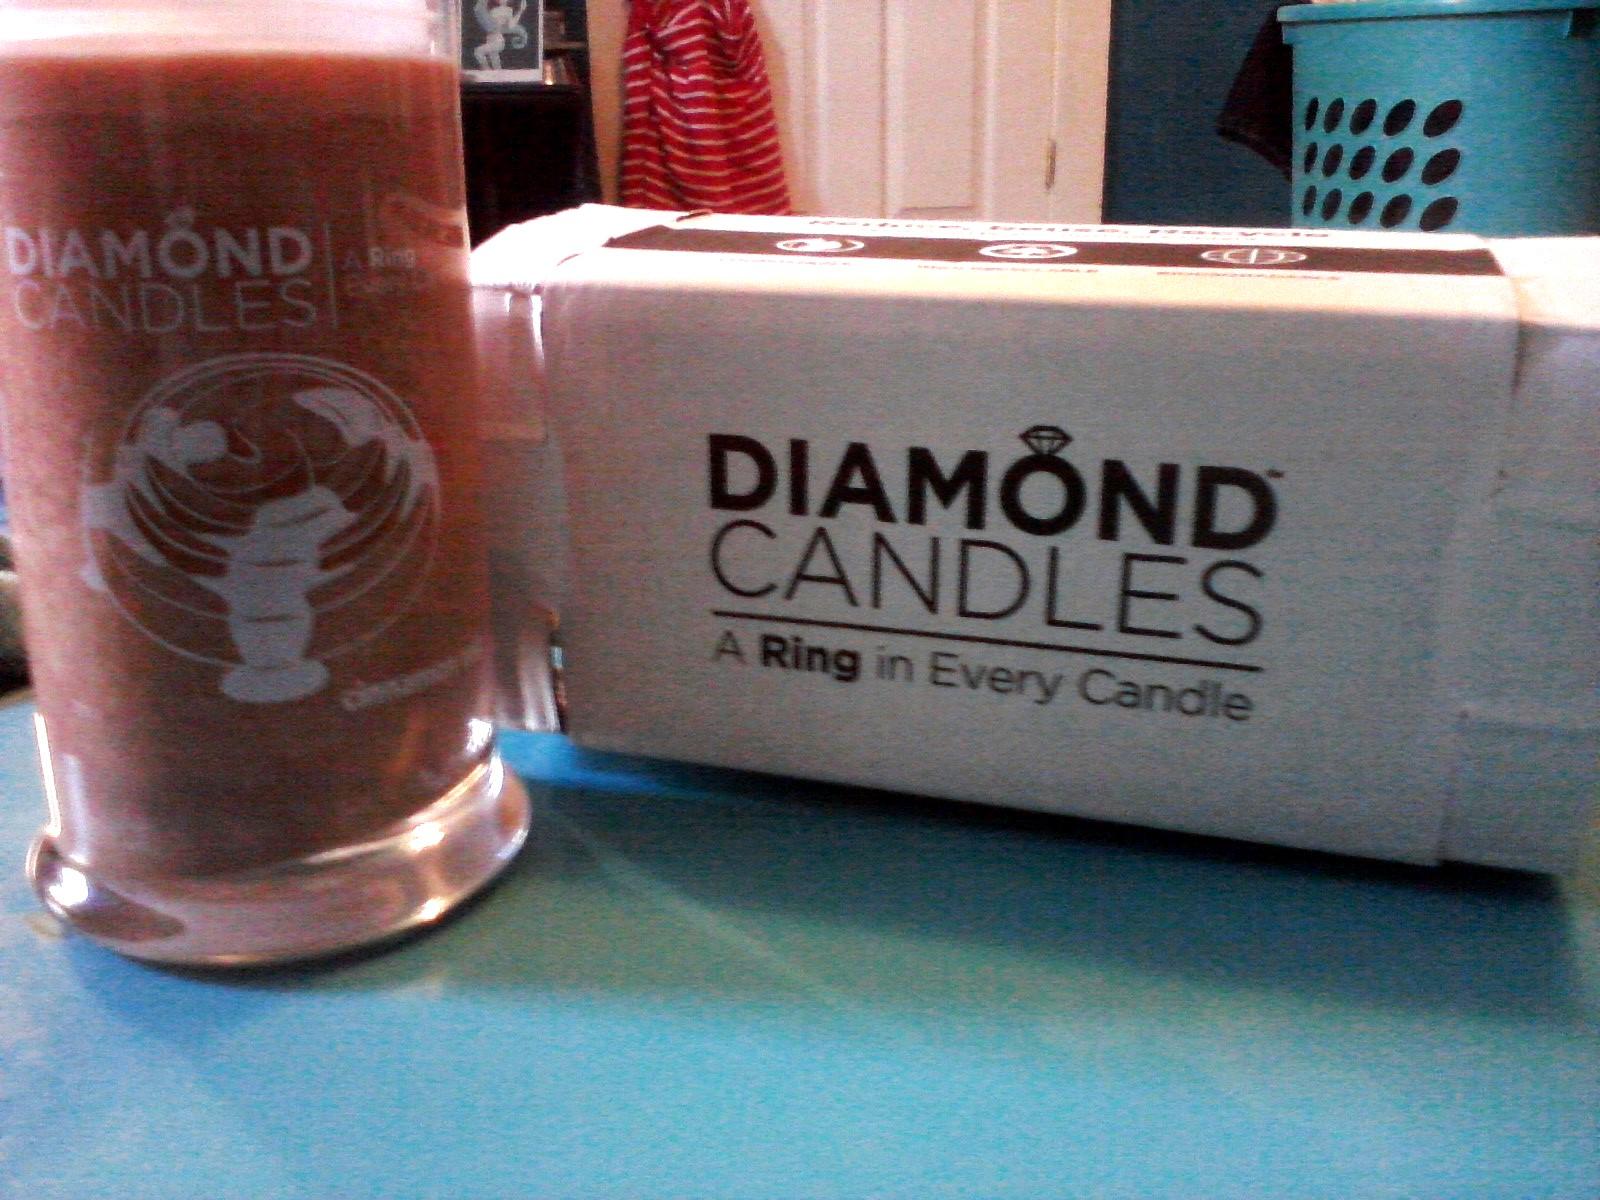 Diamond candles coupon codes